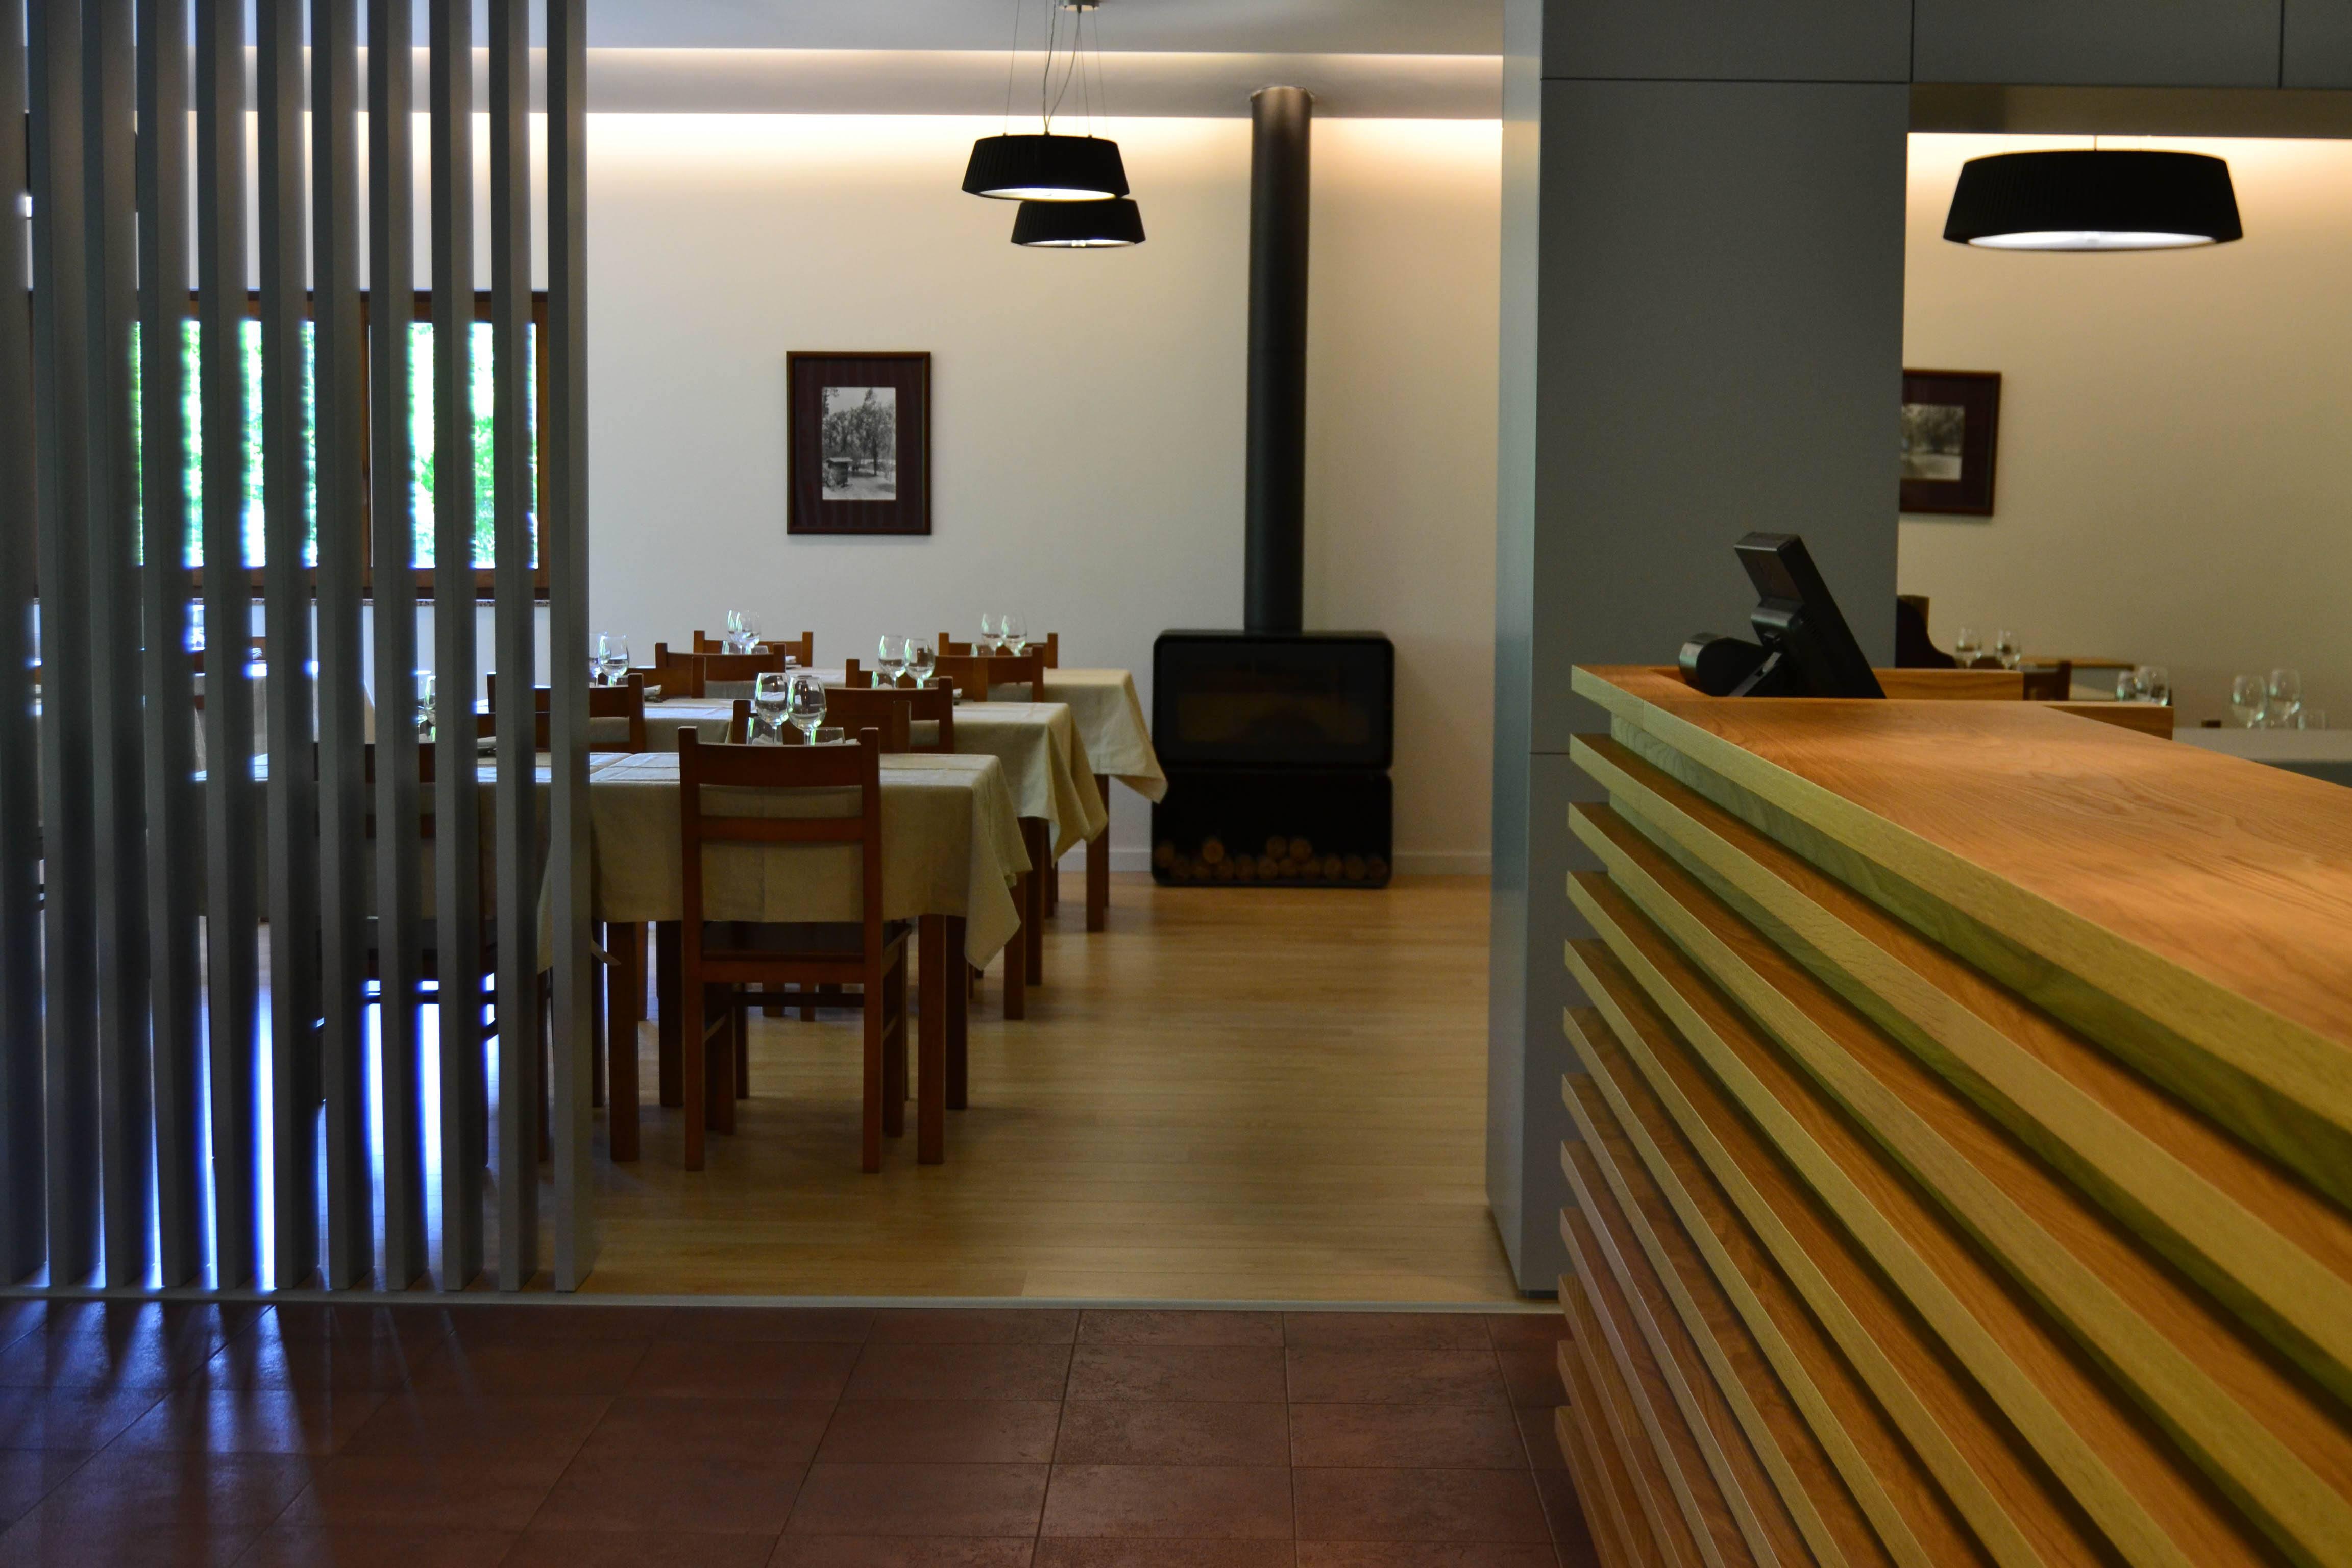 Parque Cerdeira Restaurante - interior